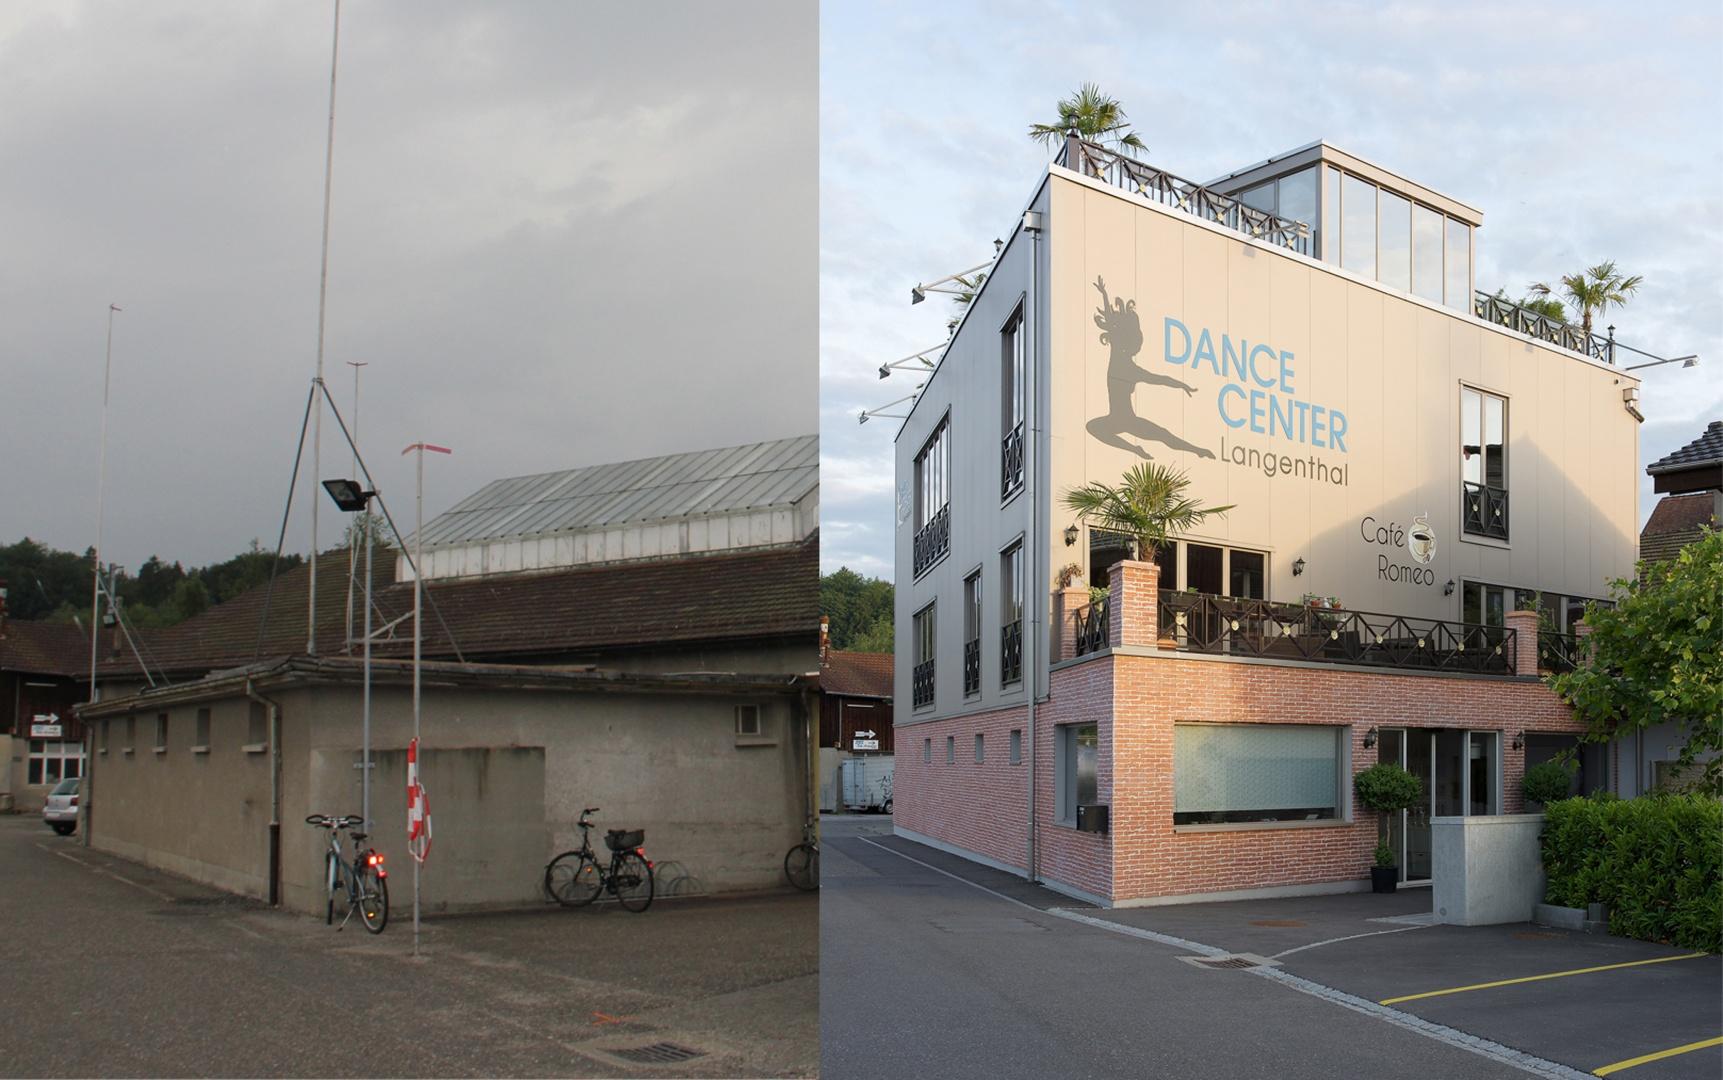 Vorher Nachher Vergleich © Reto Meier, Kirchberg